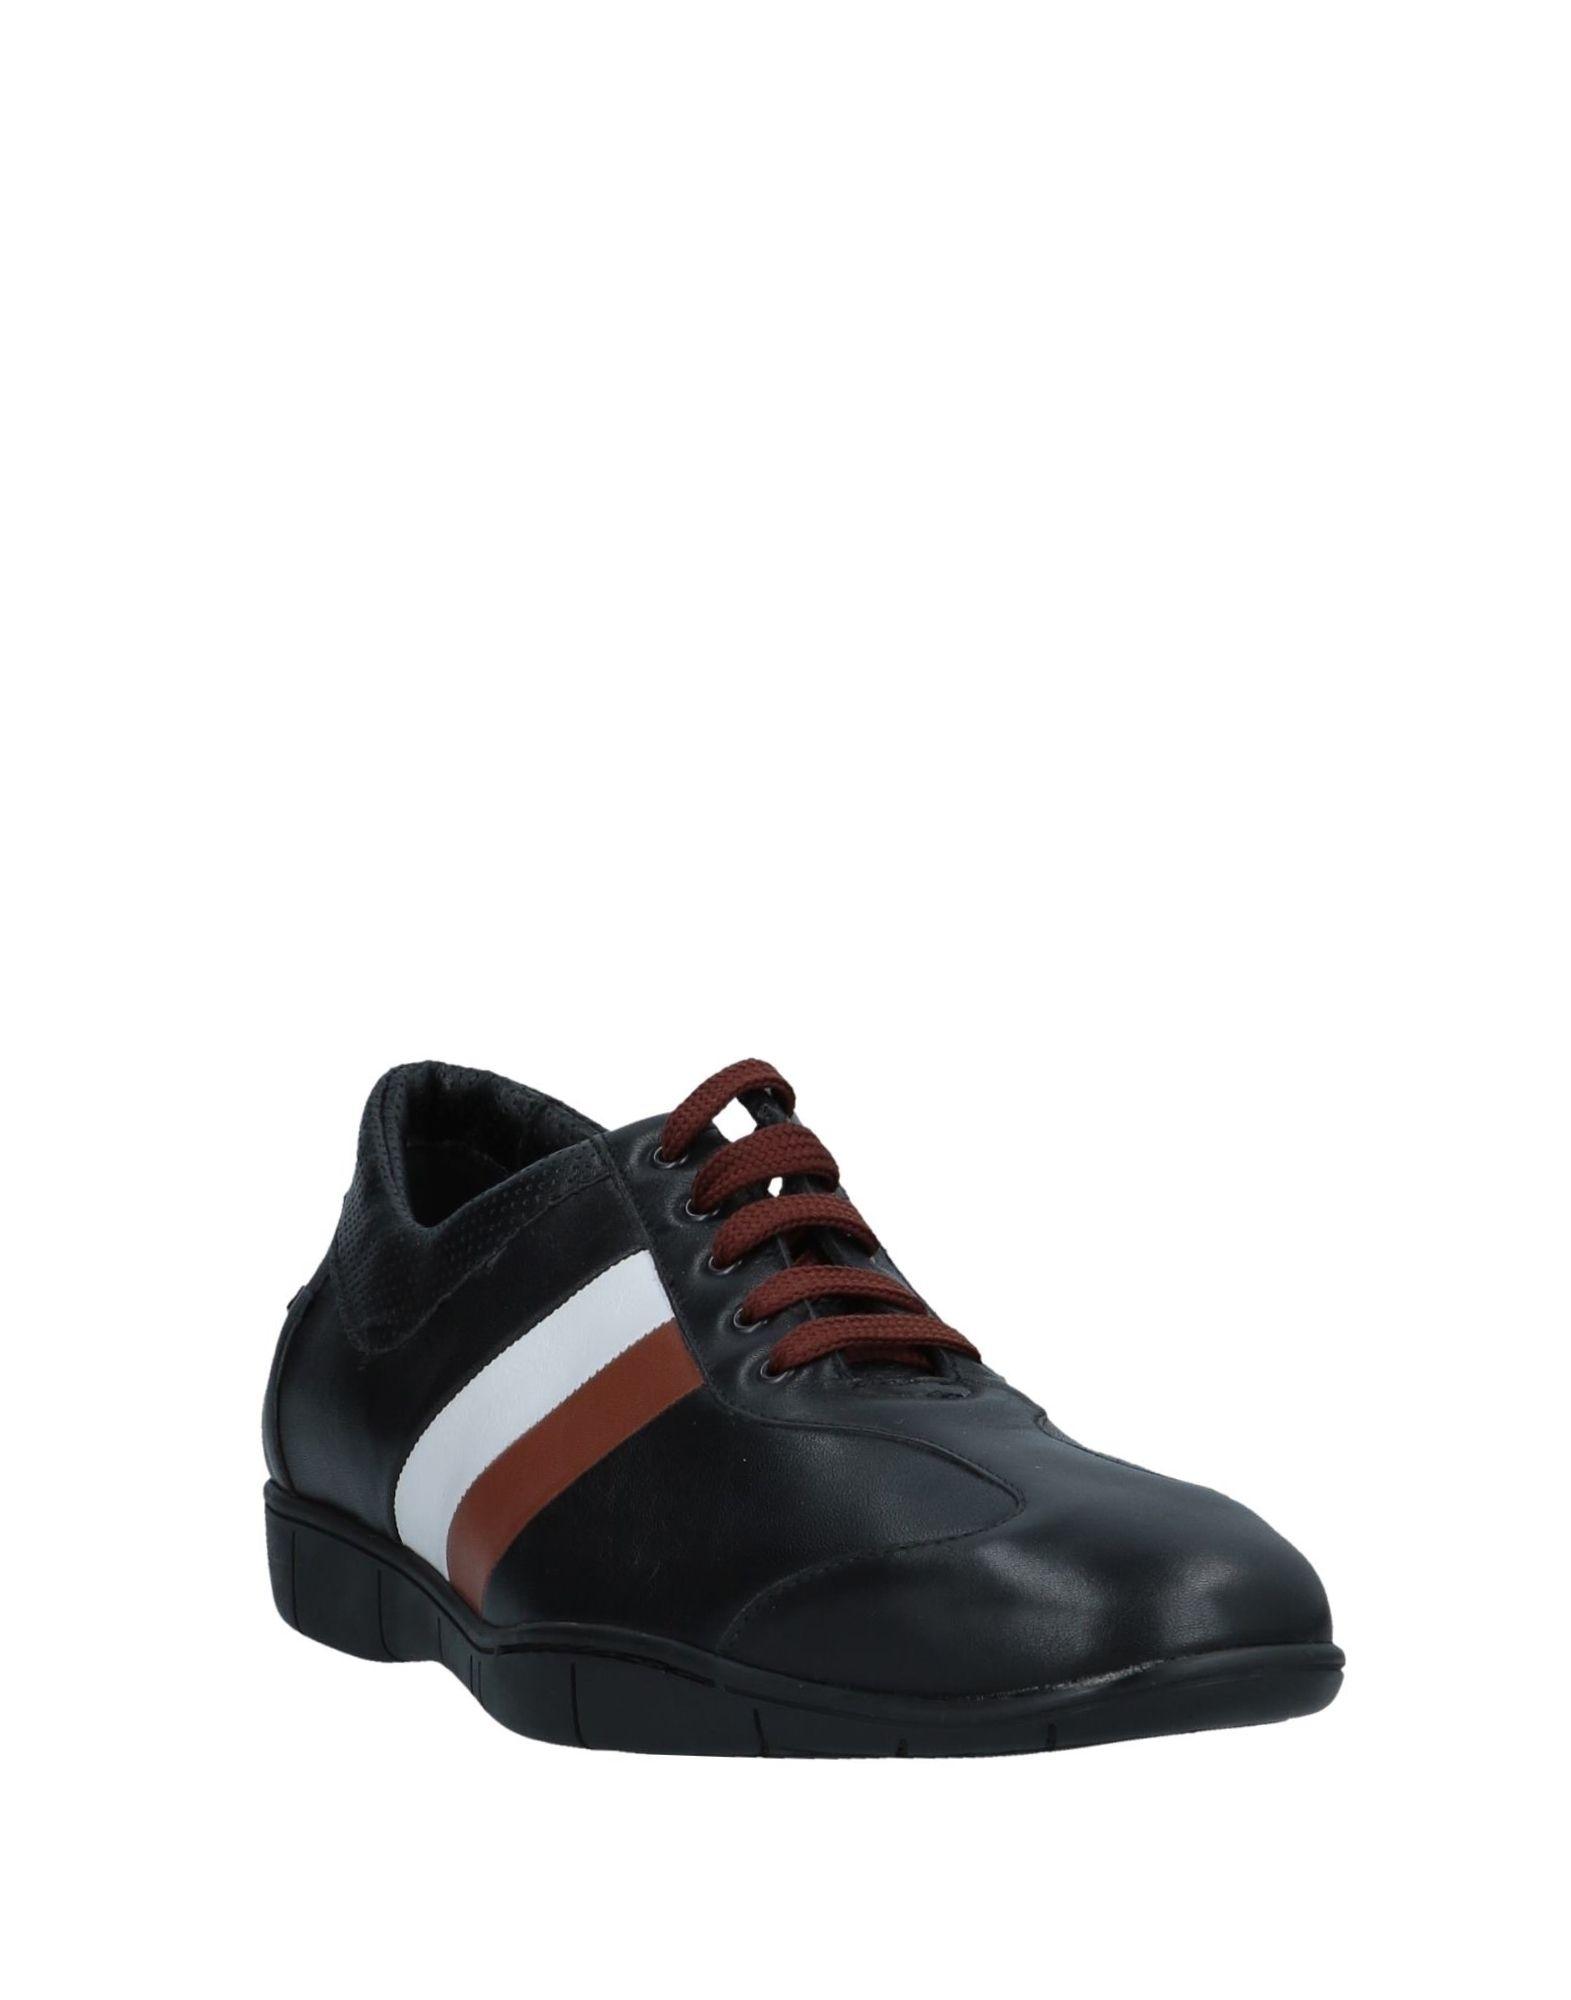 A.Testoni Gute Sneakers Herren  11555462QS Gute A.Testoni Qualität beliebte Schuhe 943b93